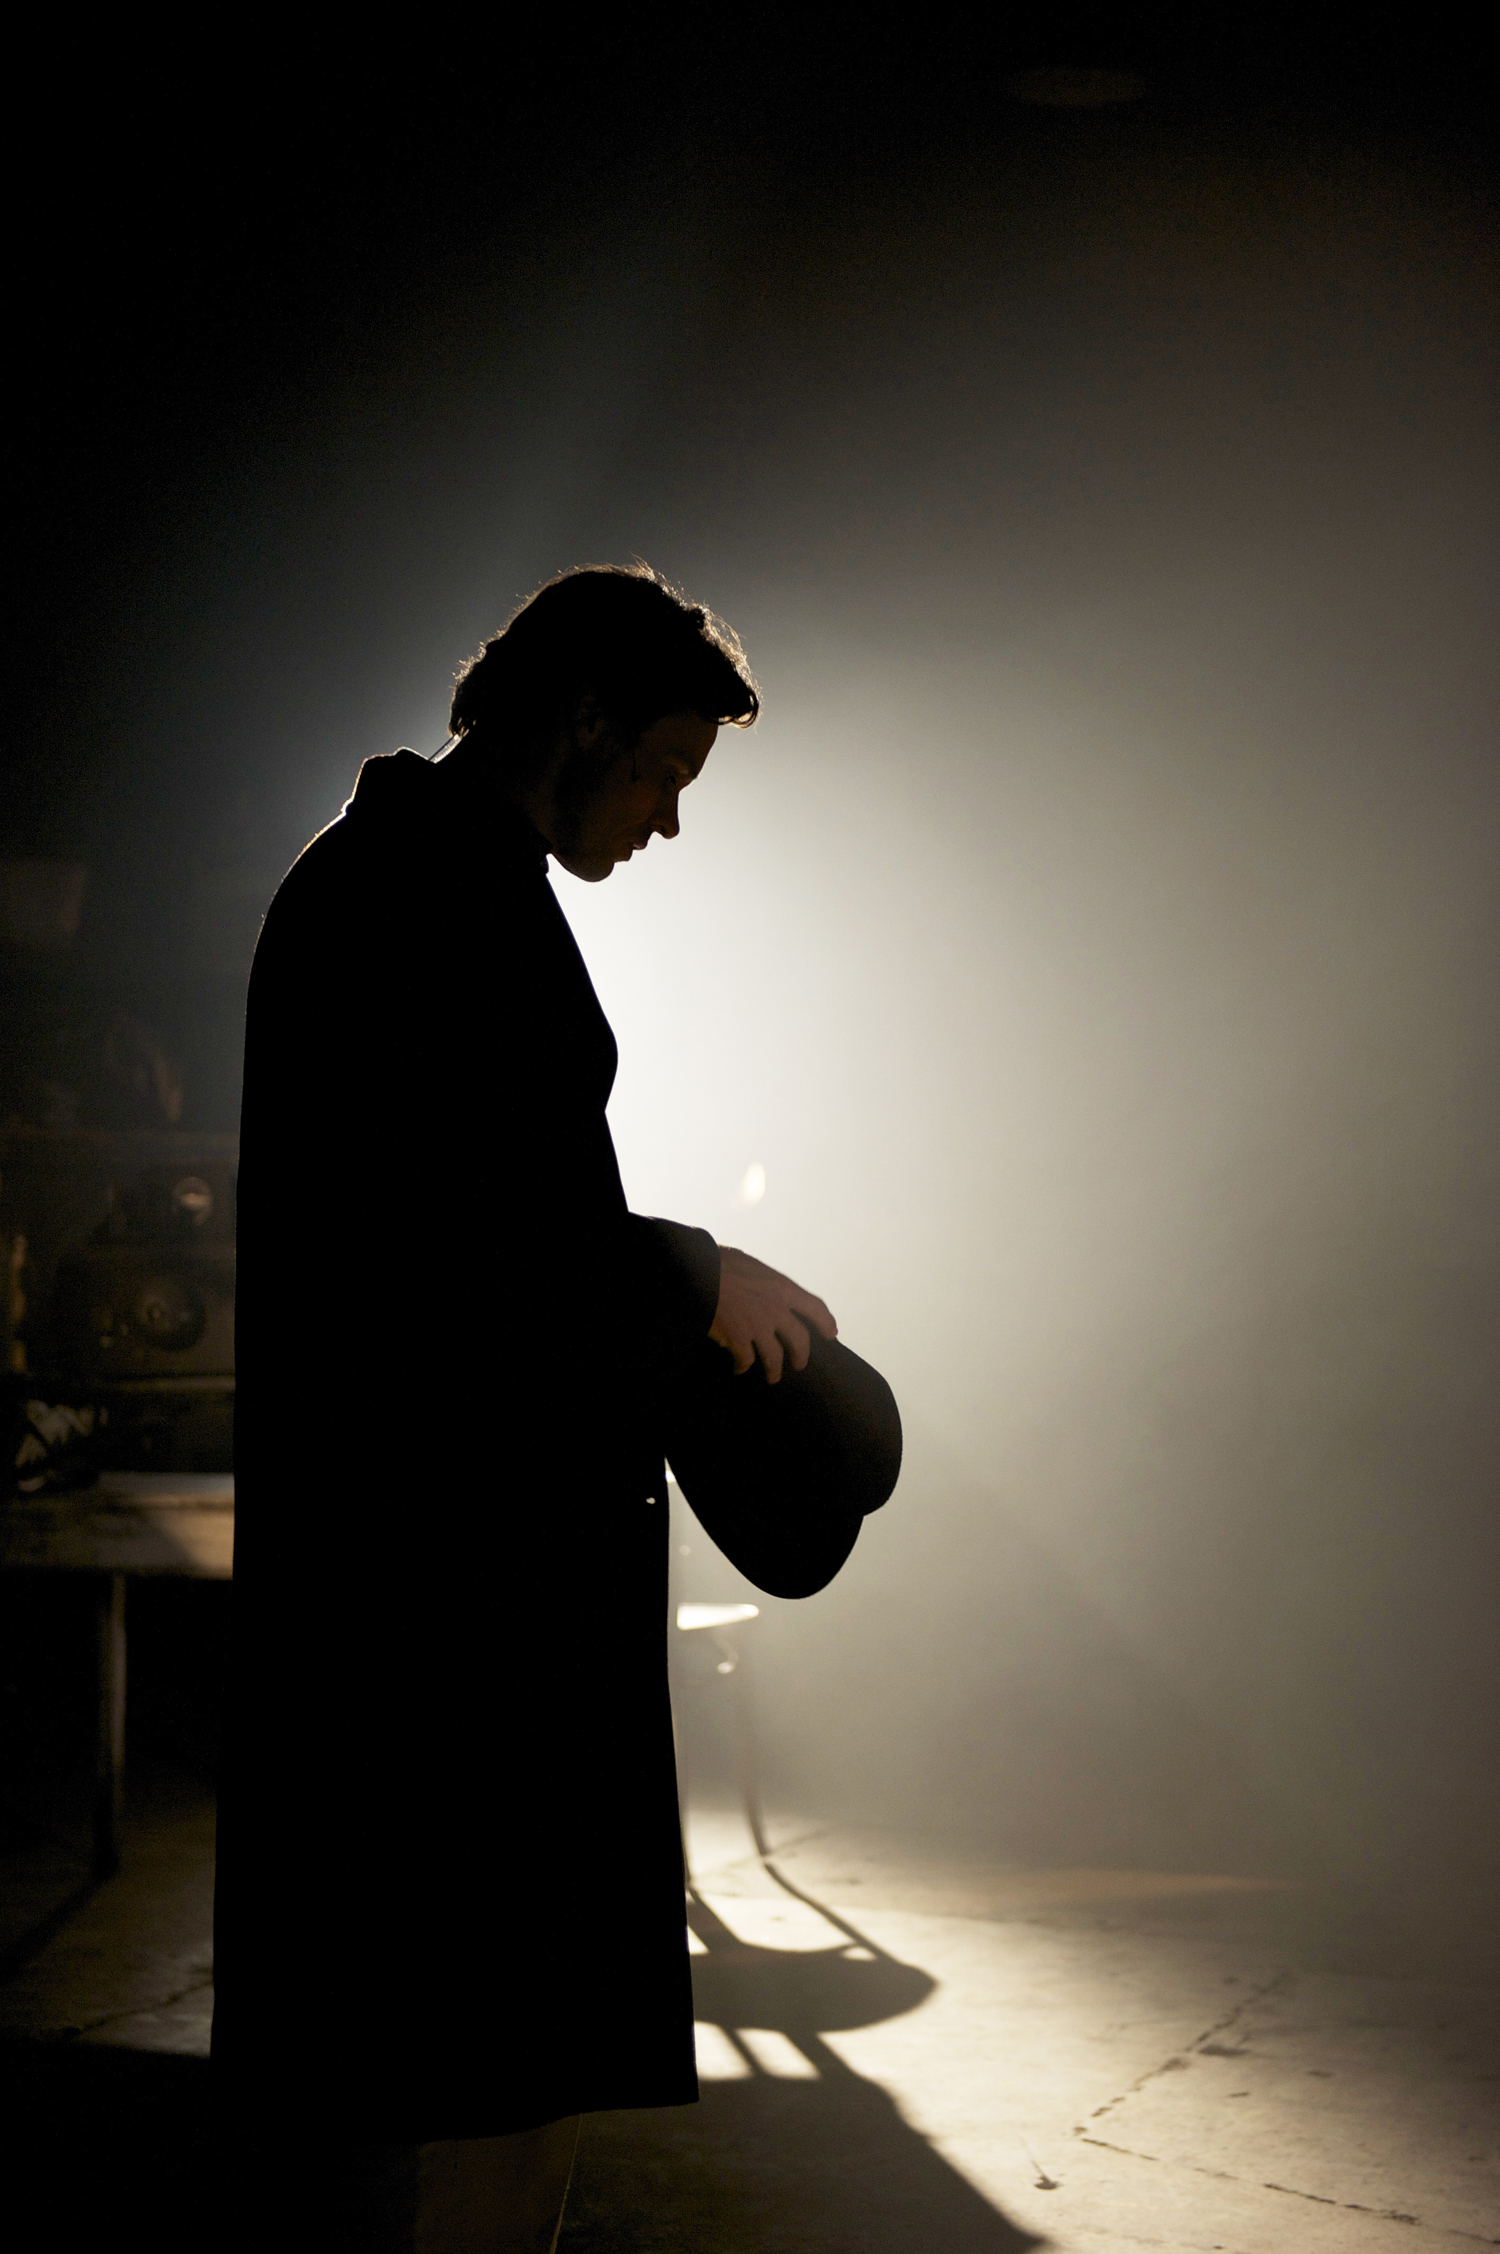 theatre-Norman-Bowman-photo.jpg